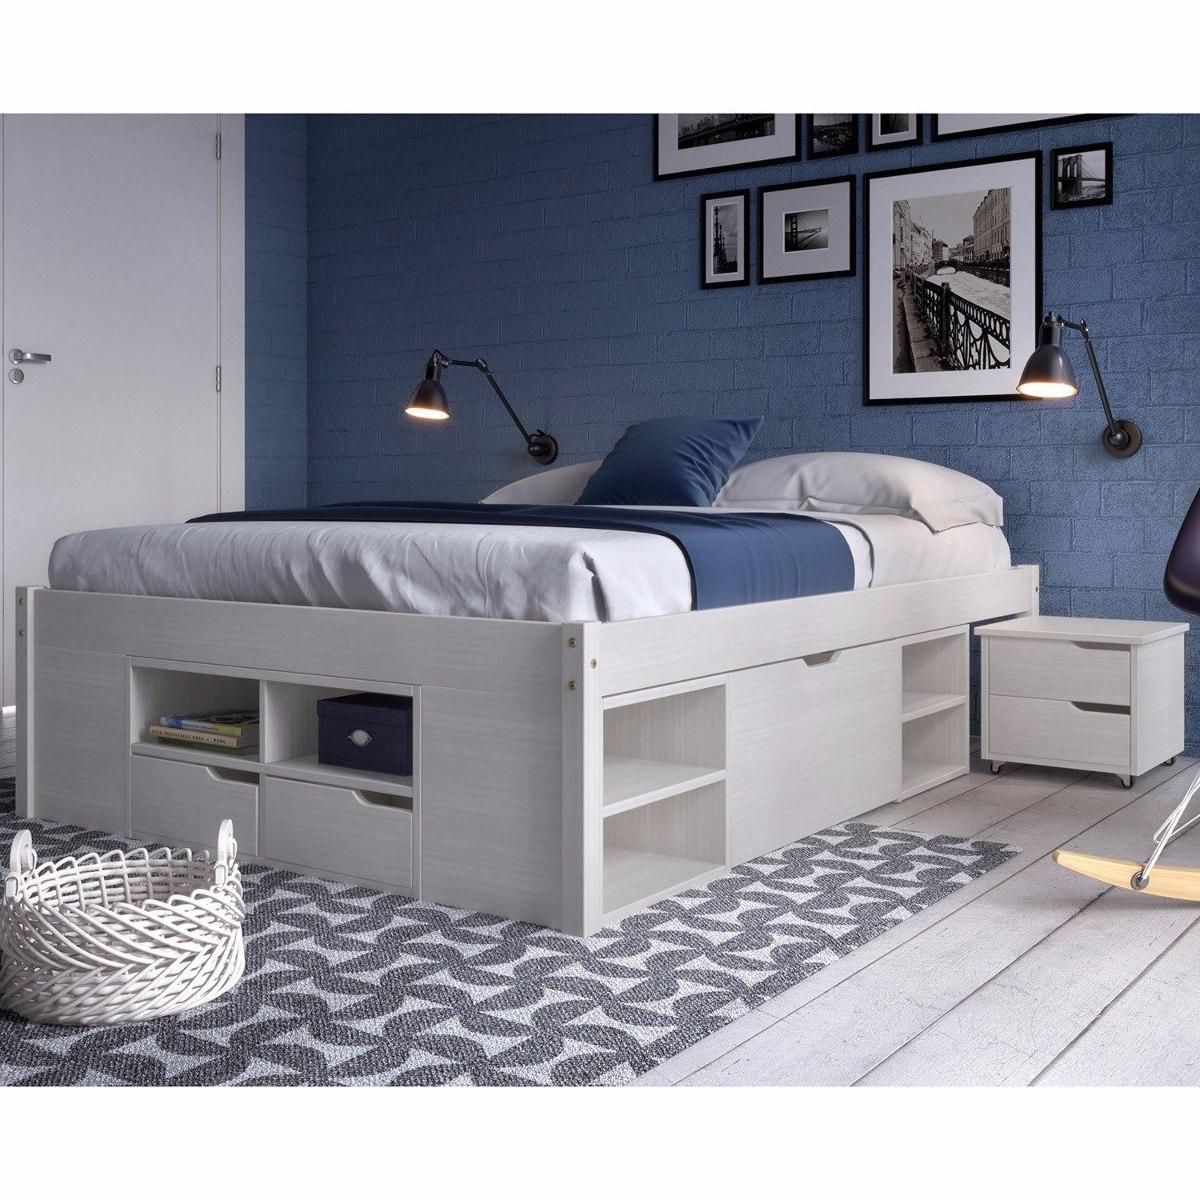 a9be80aec4 cama casal multifuncional madeira maciça 6 gavetas ee. Carregando zoom.